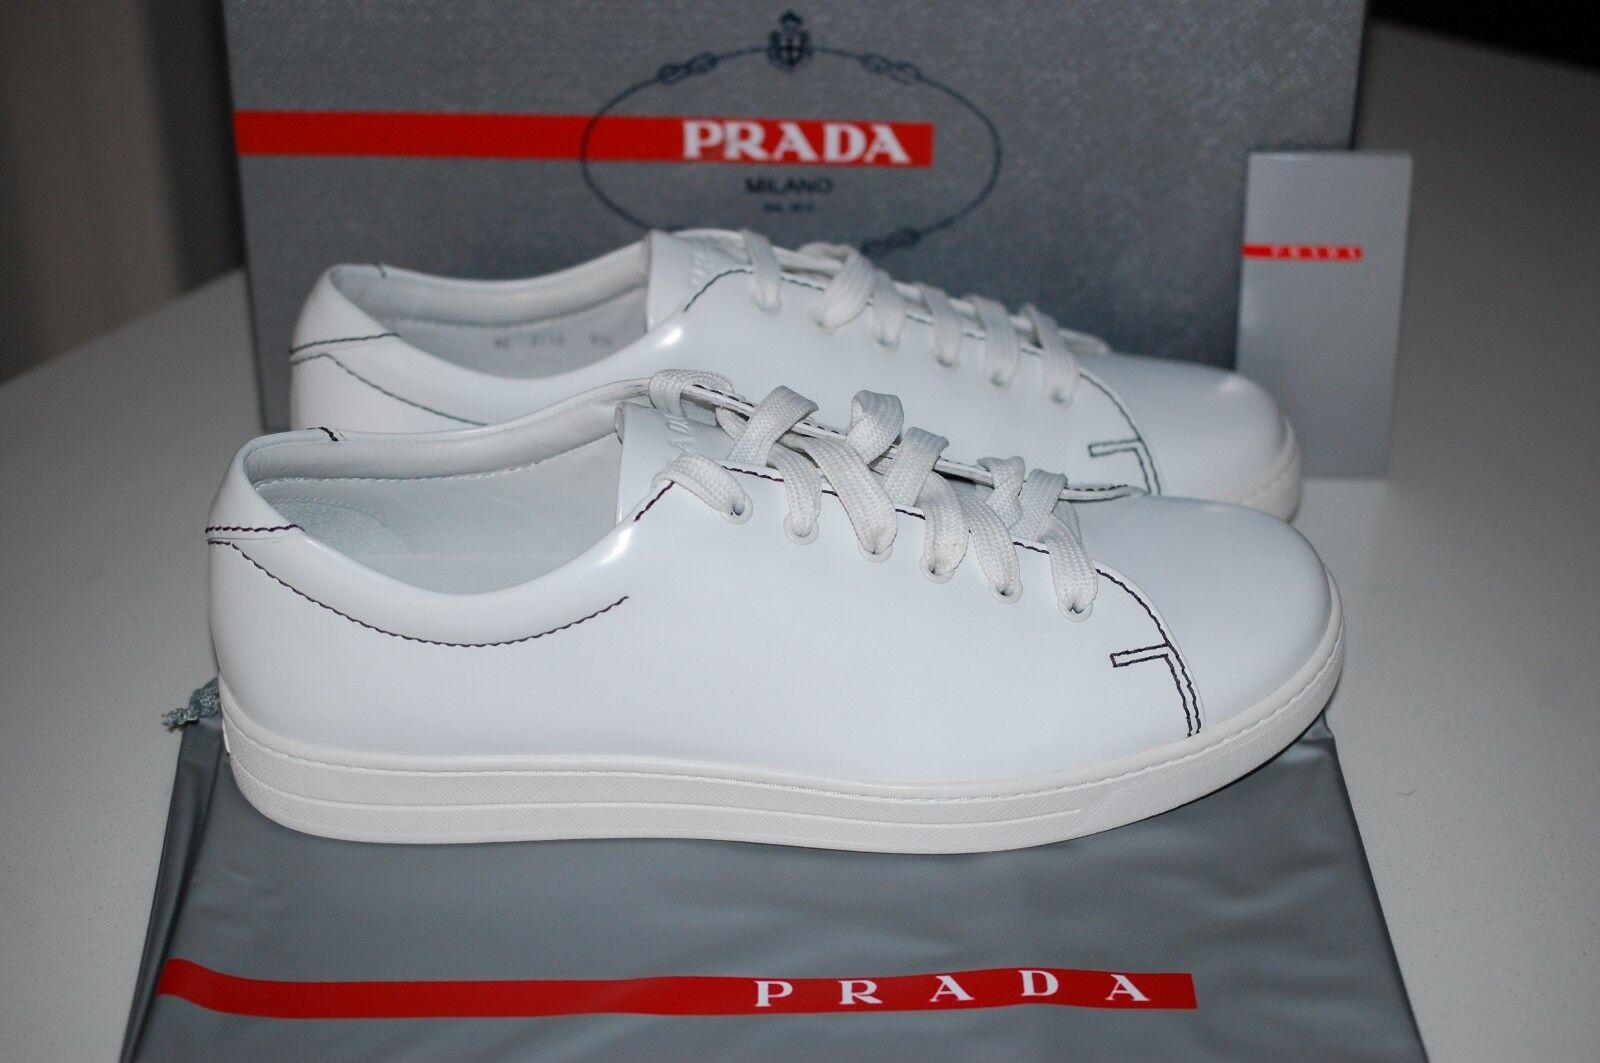 PRADA bianca Tonal Leather Low-Top Men's Designer scarpe da ginnastica scarpe 10.5 US   9.5 UK